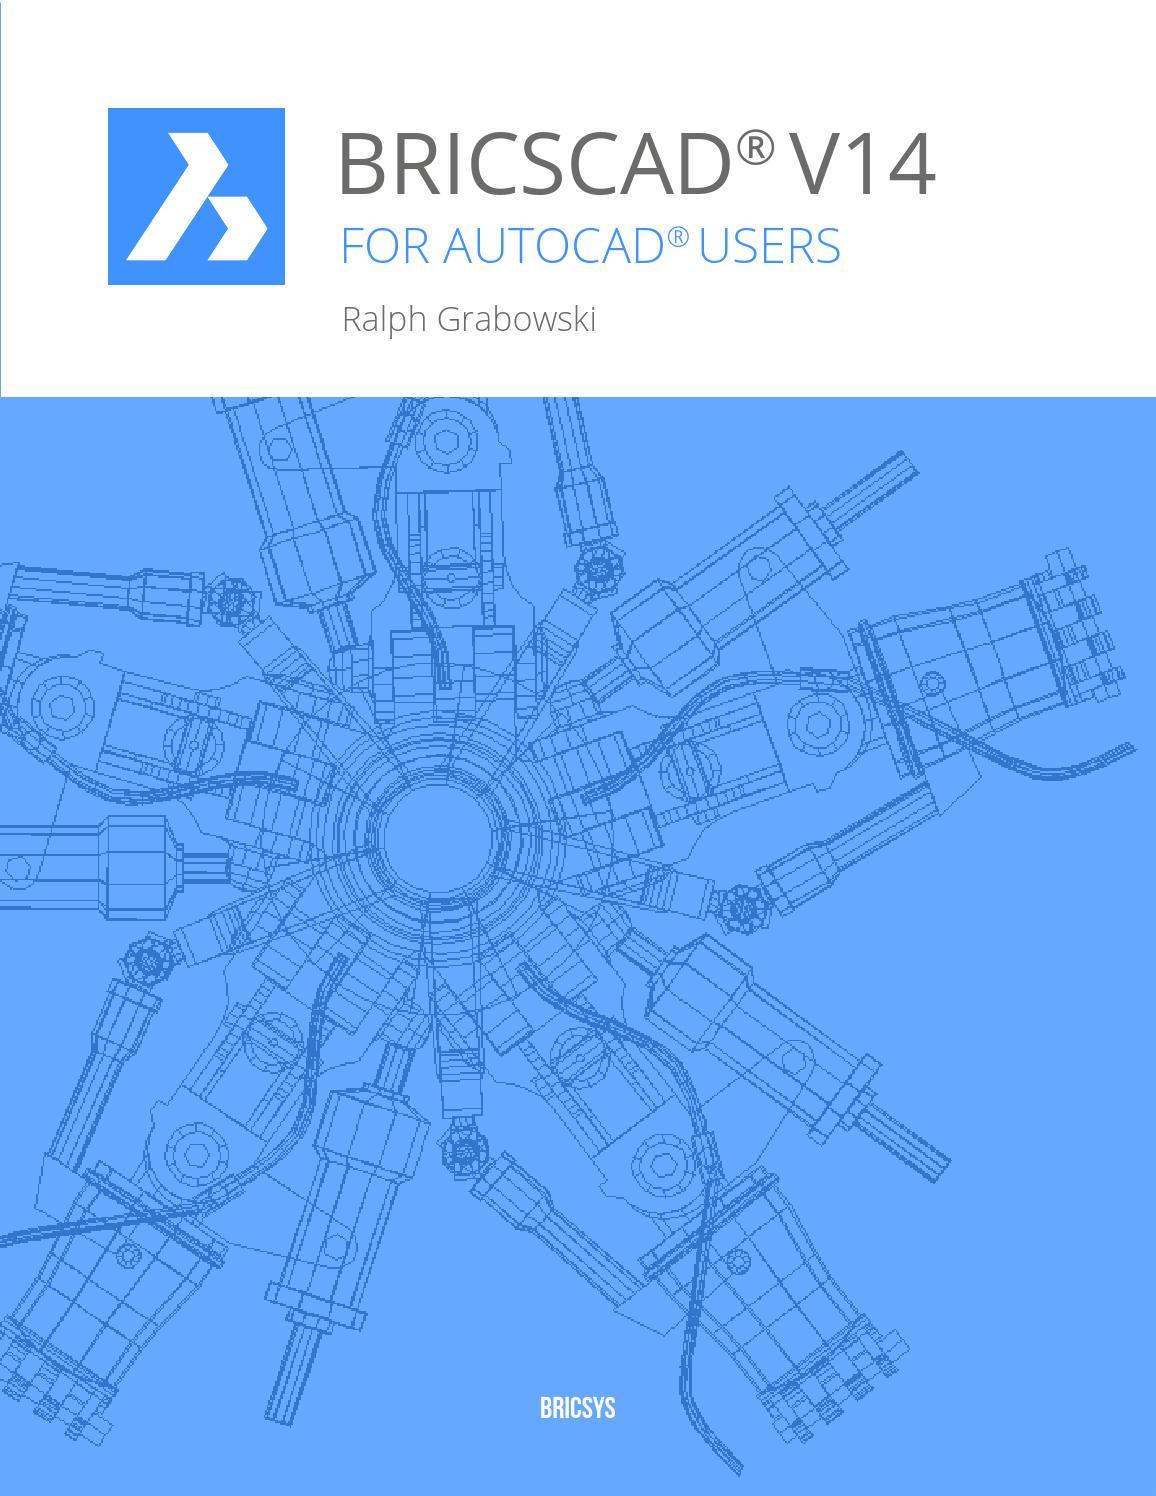 BricsCAD V14 & AutoCAD 2014 by Eurographics Italia - issuu